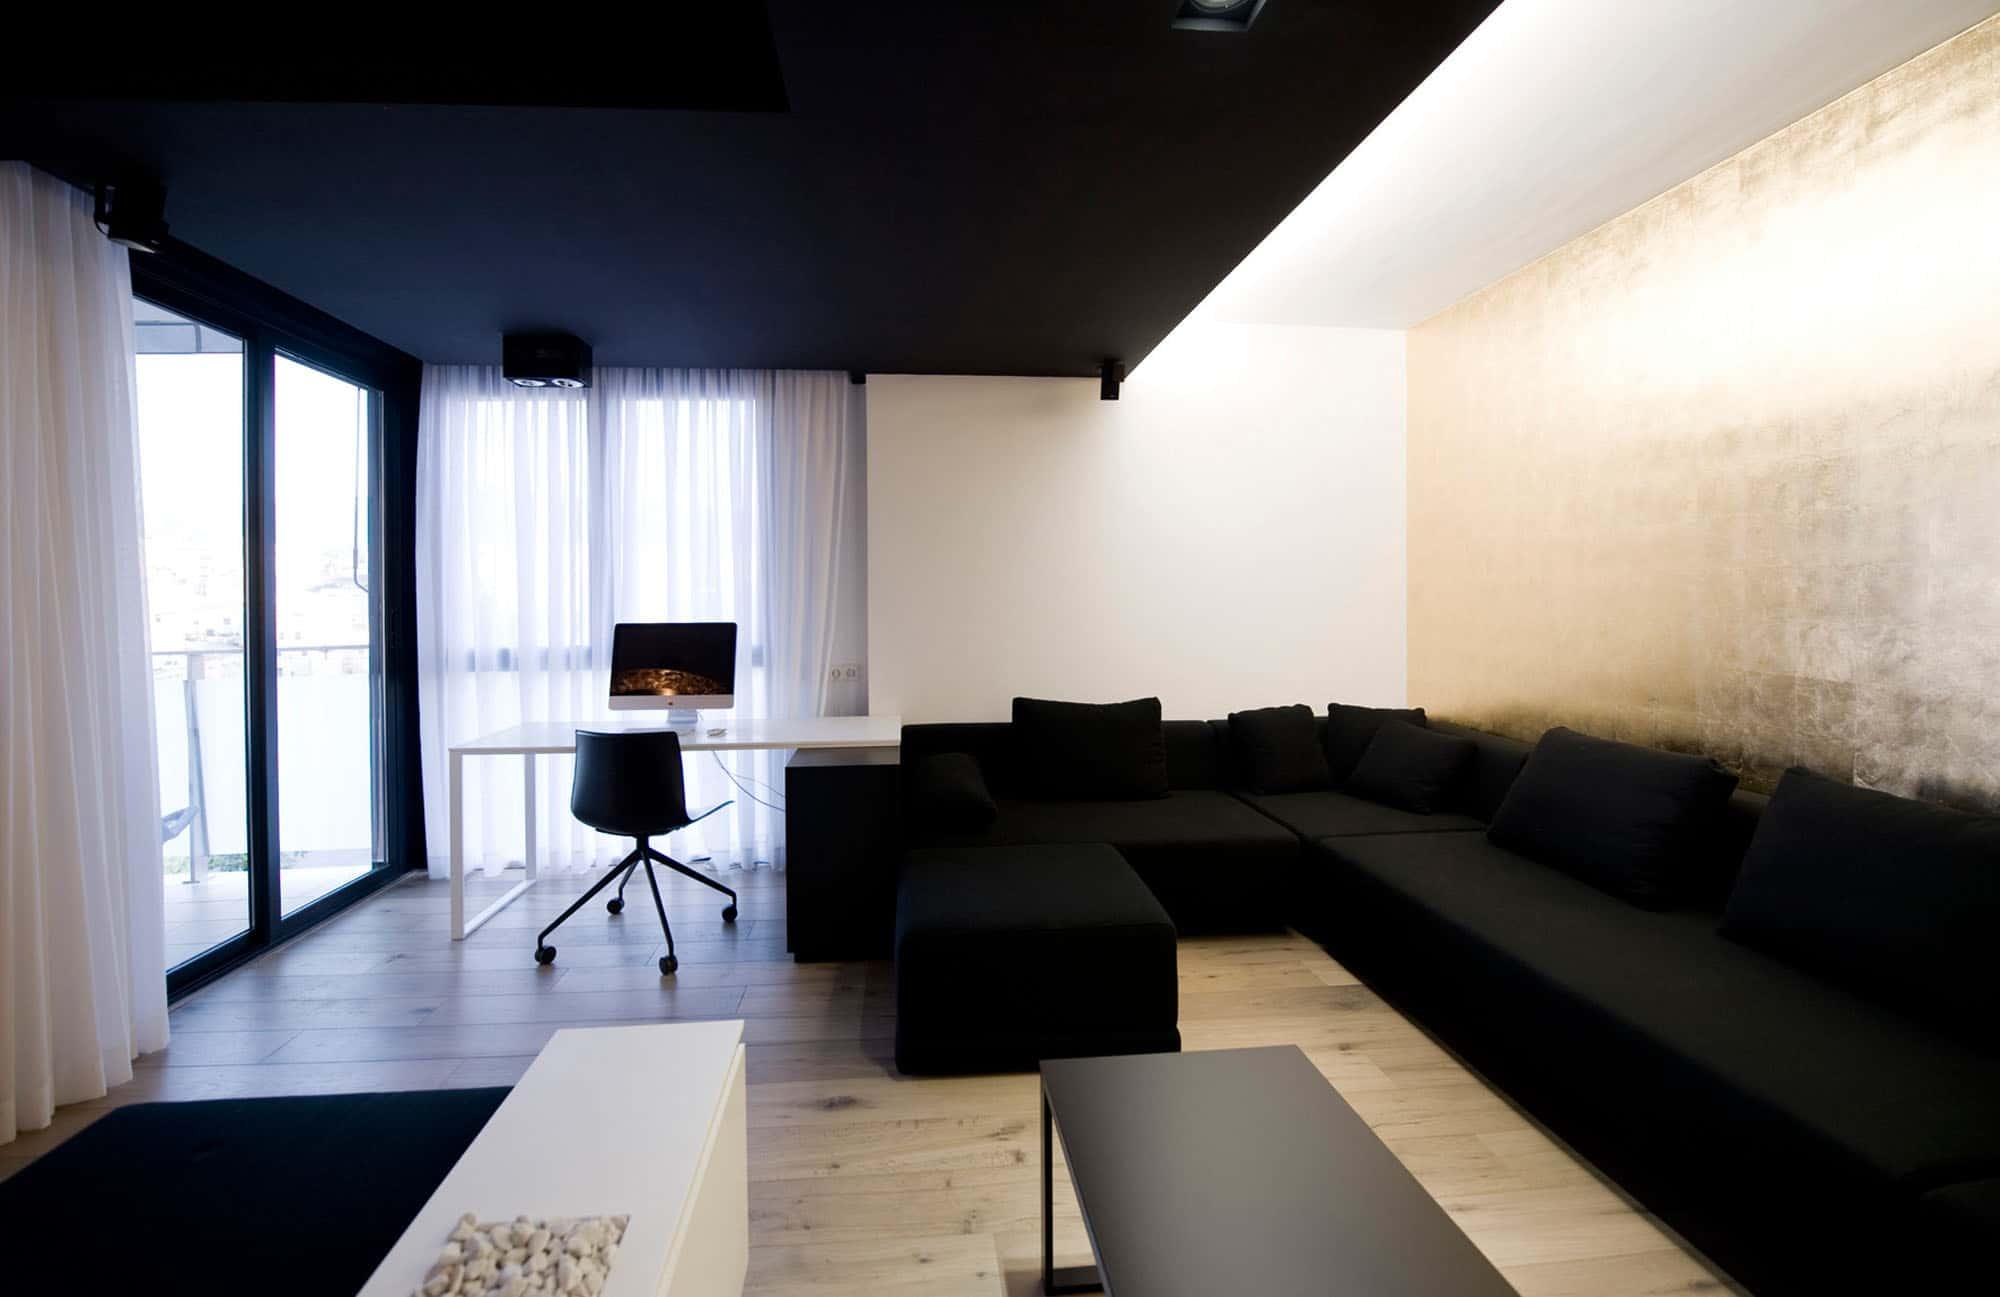 HI-MACS Doble Dueto Apartment by Cuartopensante (11)